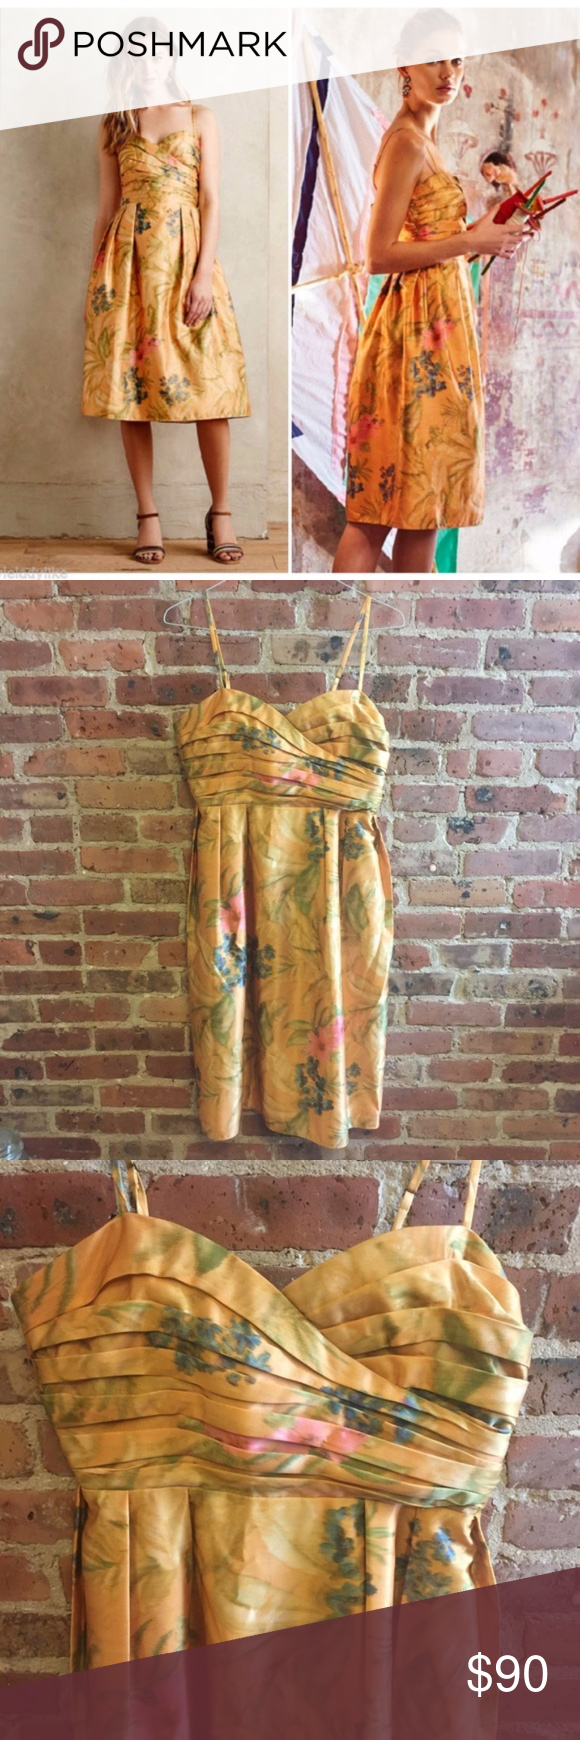 NWT James Coviello Botanical Dress Anthro 12 Imbued with